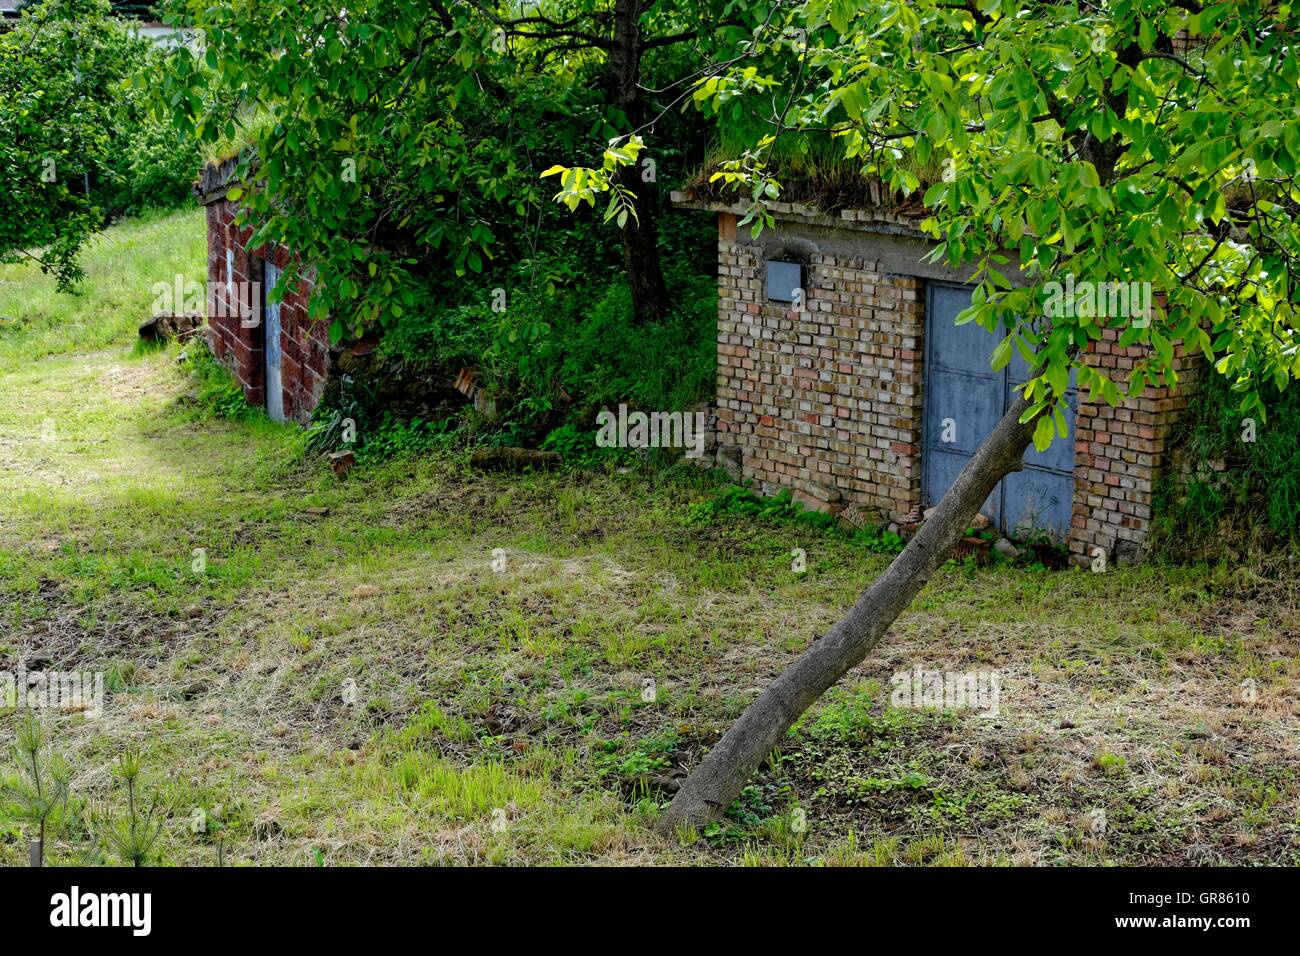 Hidden Press Houses In The Kellergasse Abasár , Hungary - Stock Image